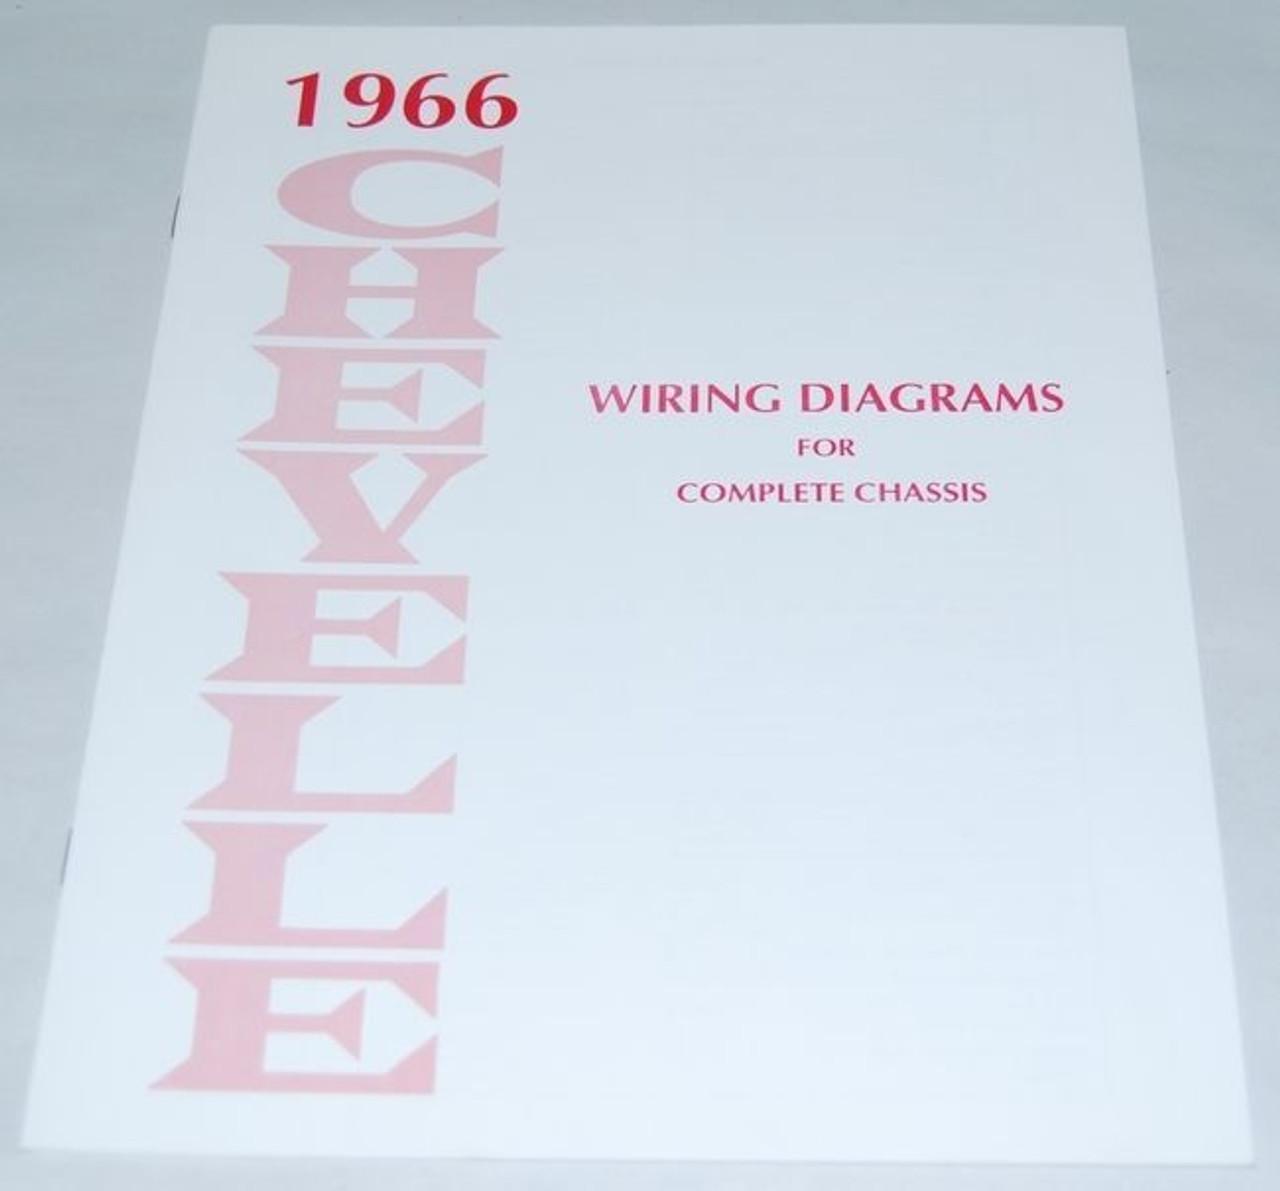 L1804_zpsavz0olte__46511.1443649111?c=2 66 1966 chevelle el camino electrical wiring diagram manual i 5 1966 el camino wiring diagram at mifinder.co